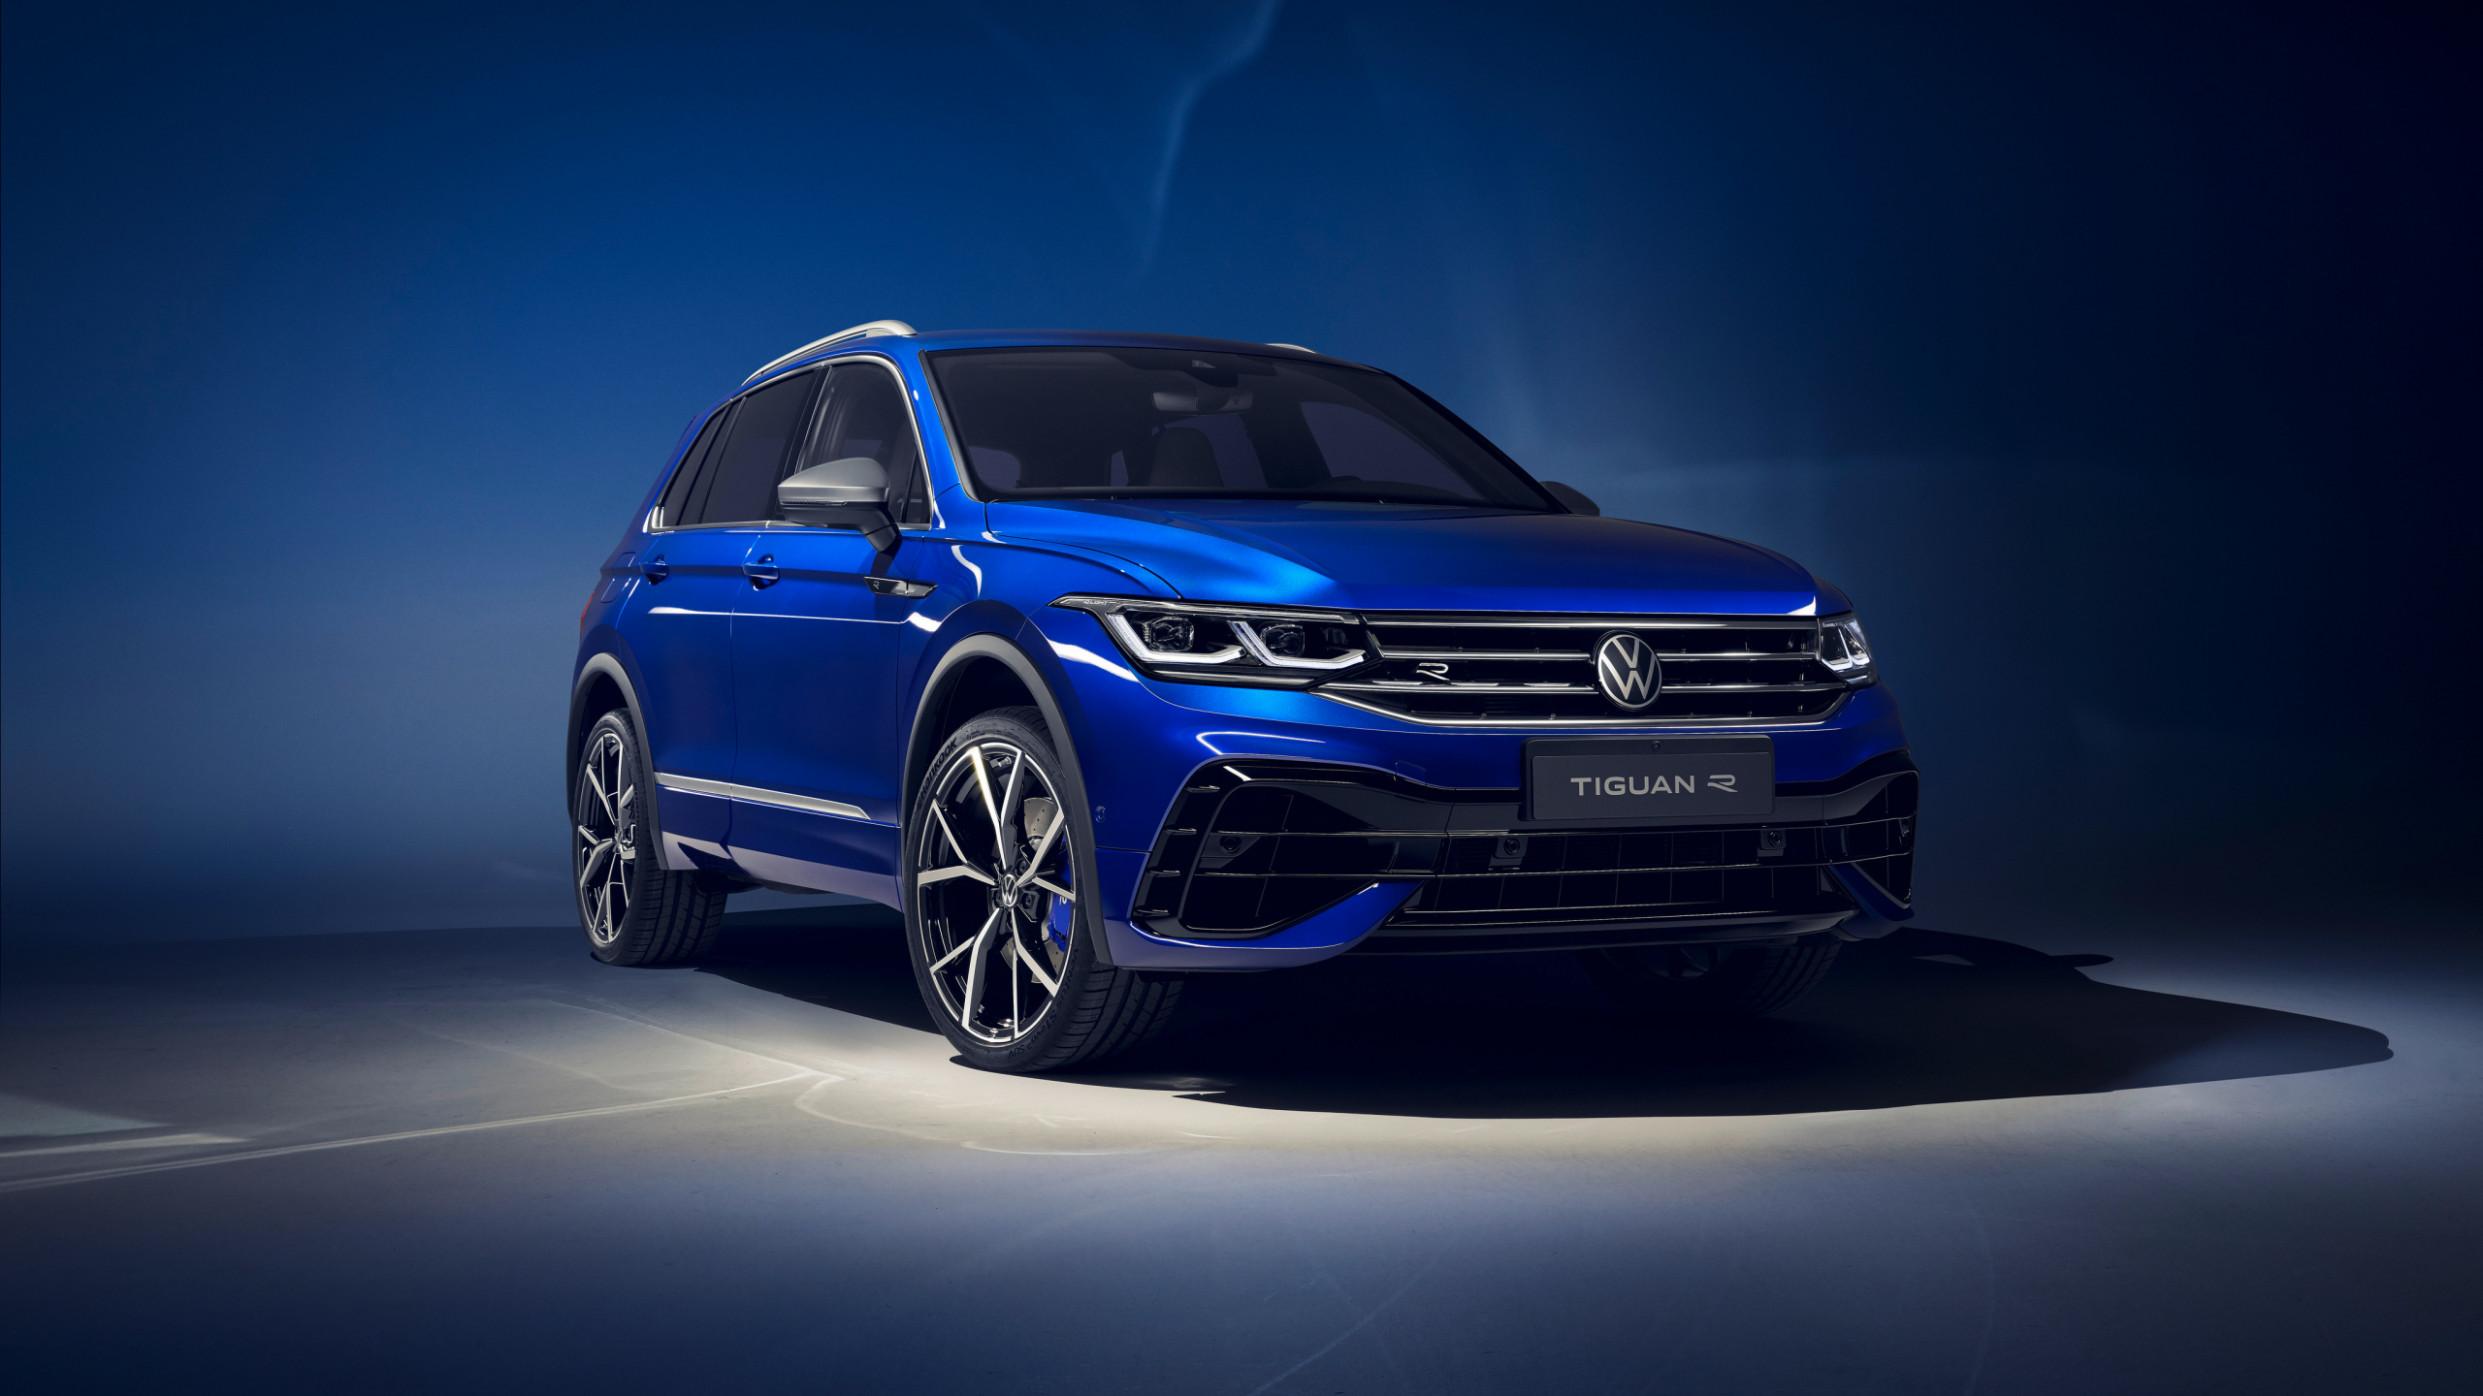 Exterior and Interior 2022 VW Tiguan